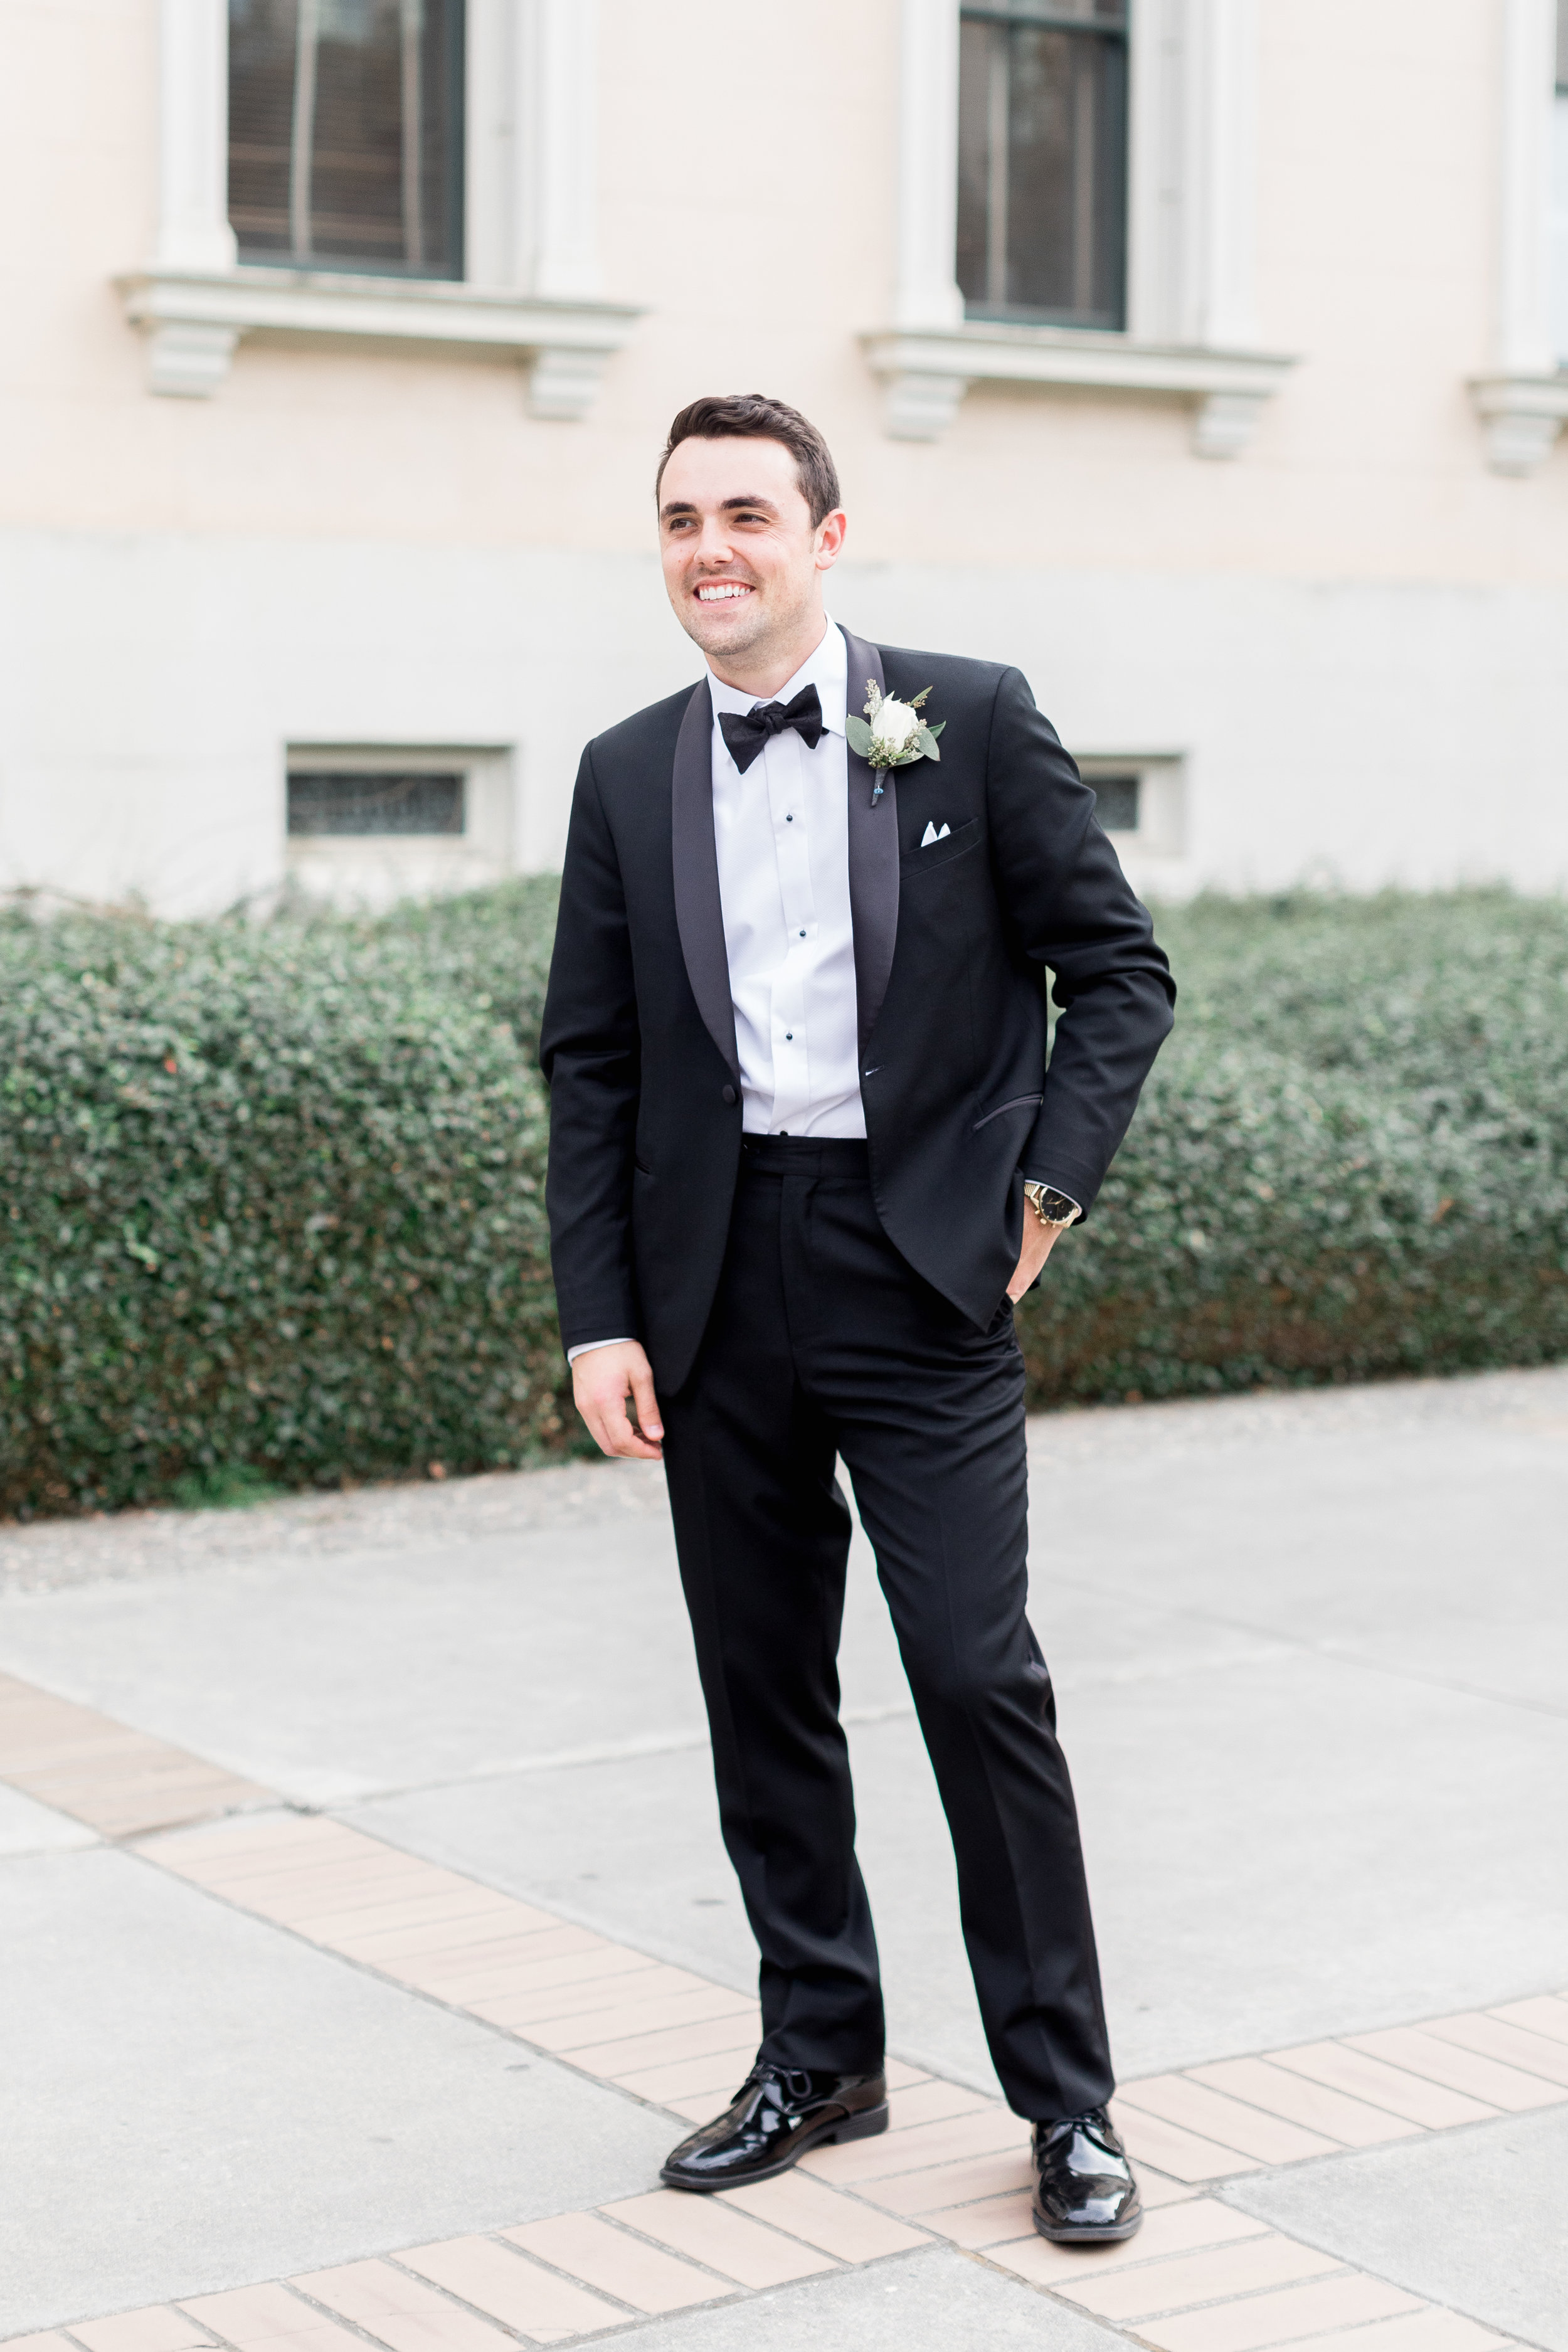 Bay-Area-San-Francisco-wedding-photographer (147 of 335).jpg